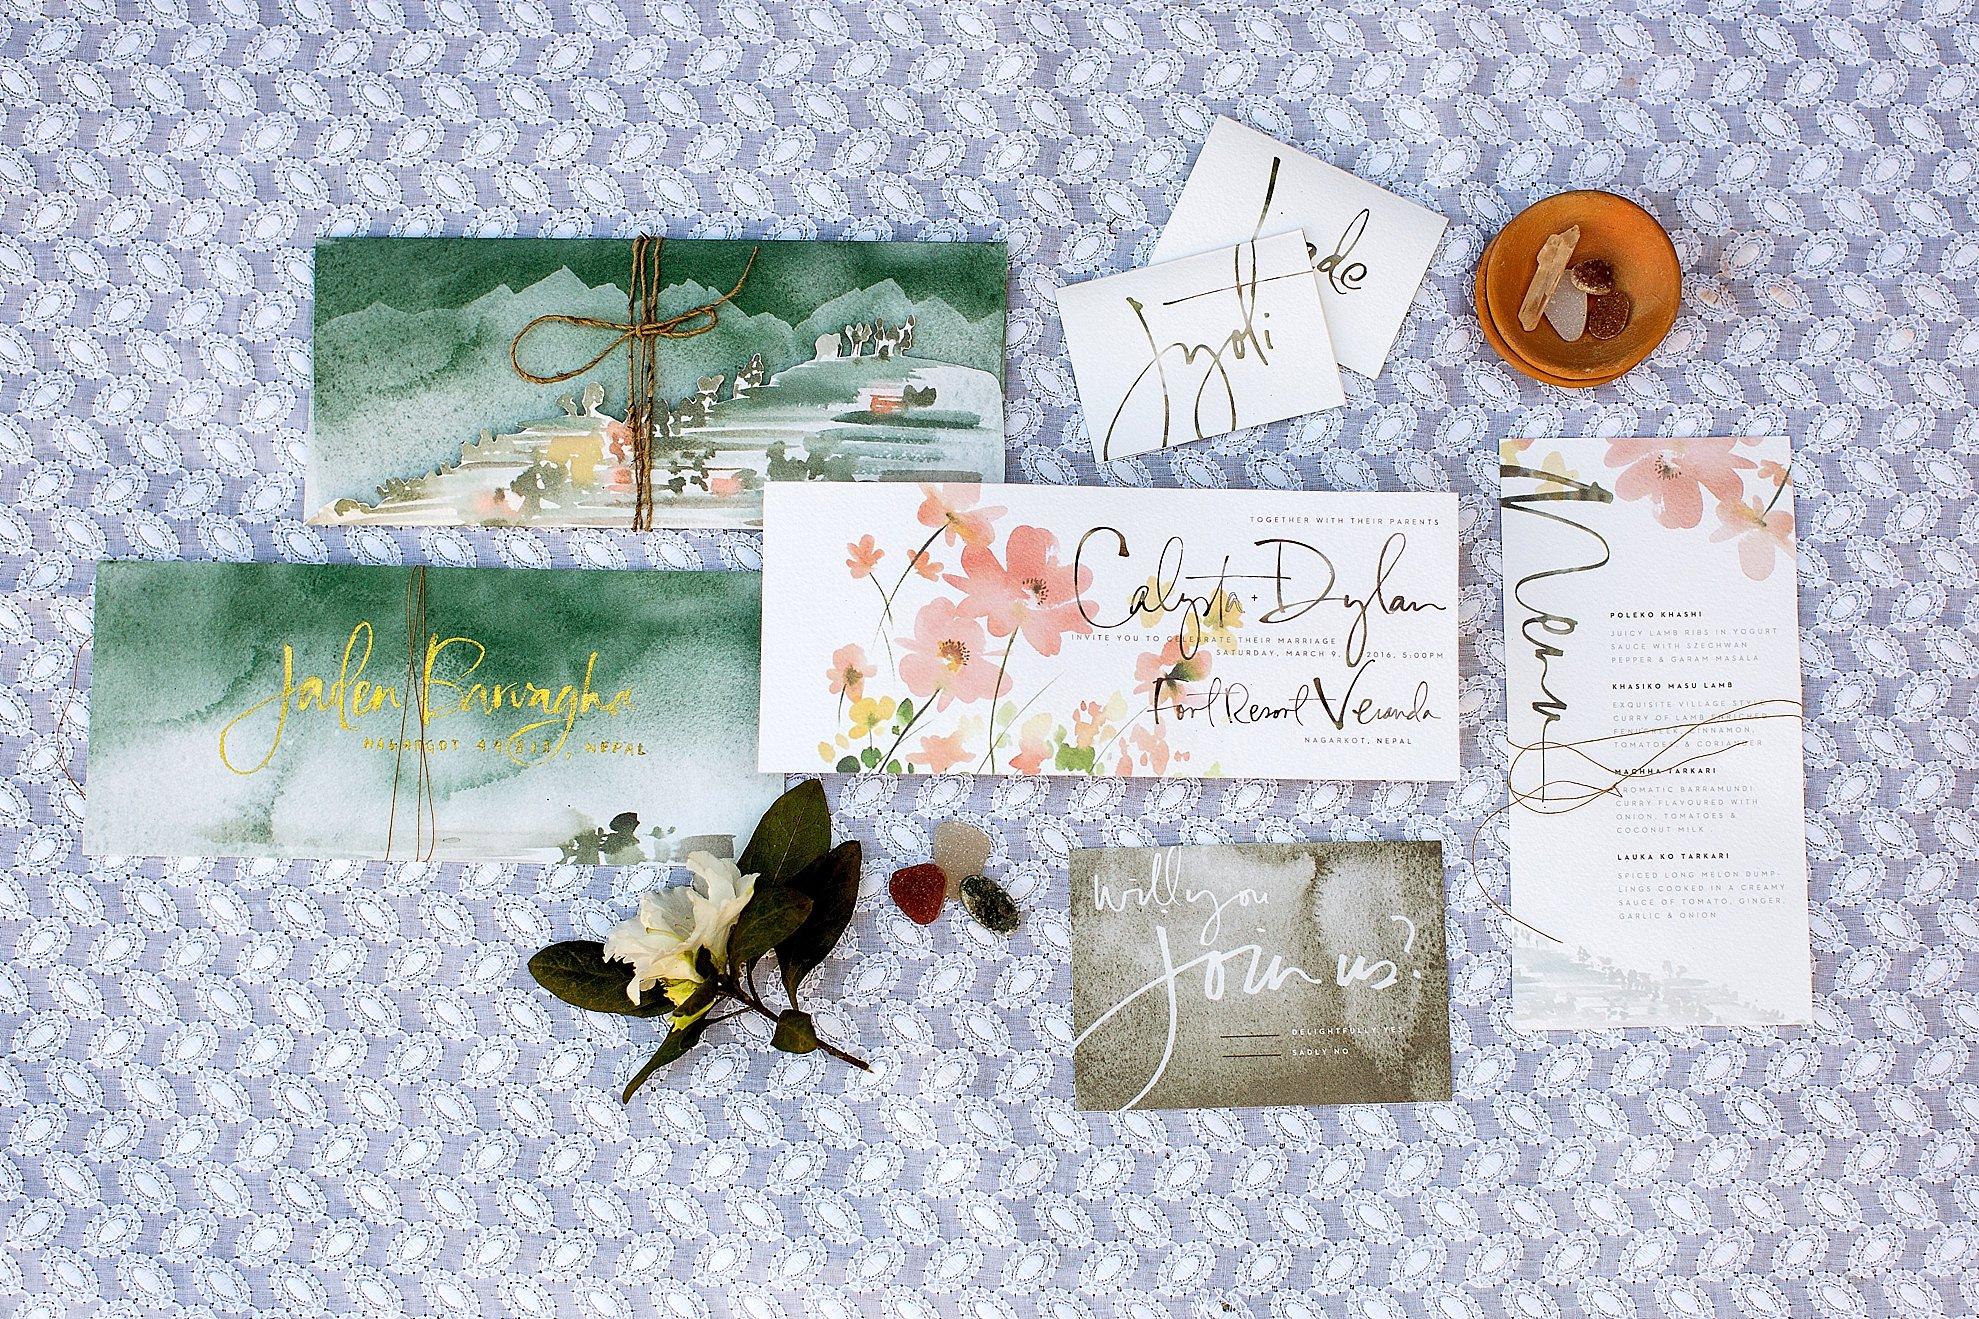 Bianca-Rijkenbarg-fotografie-for-this-romance-bruidsinspiratie-blog_0010